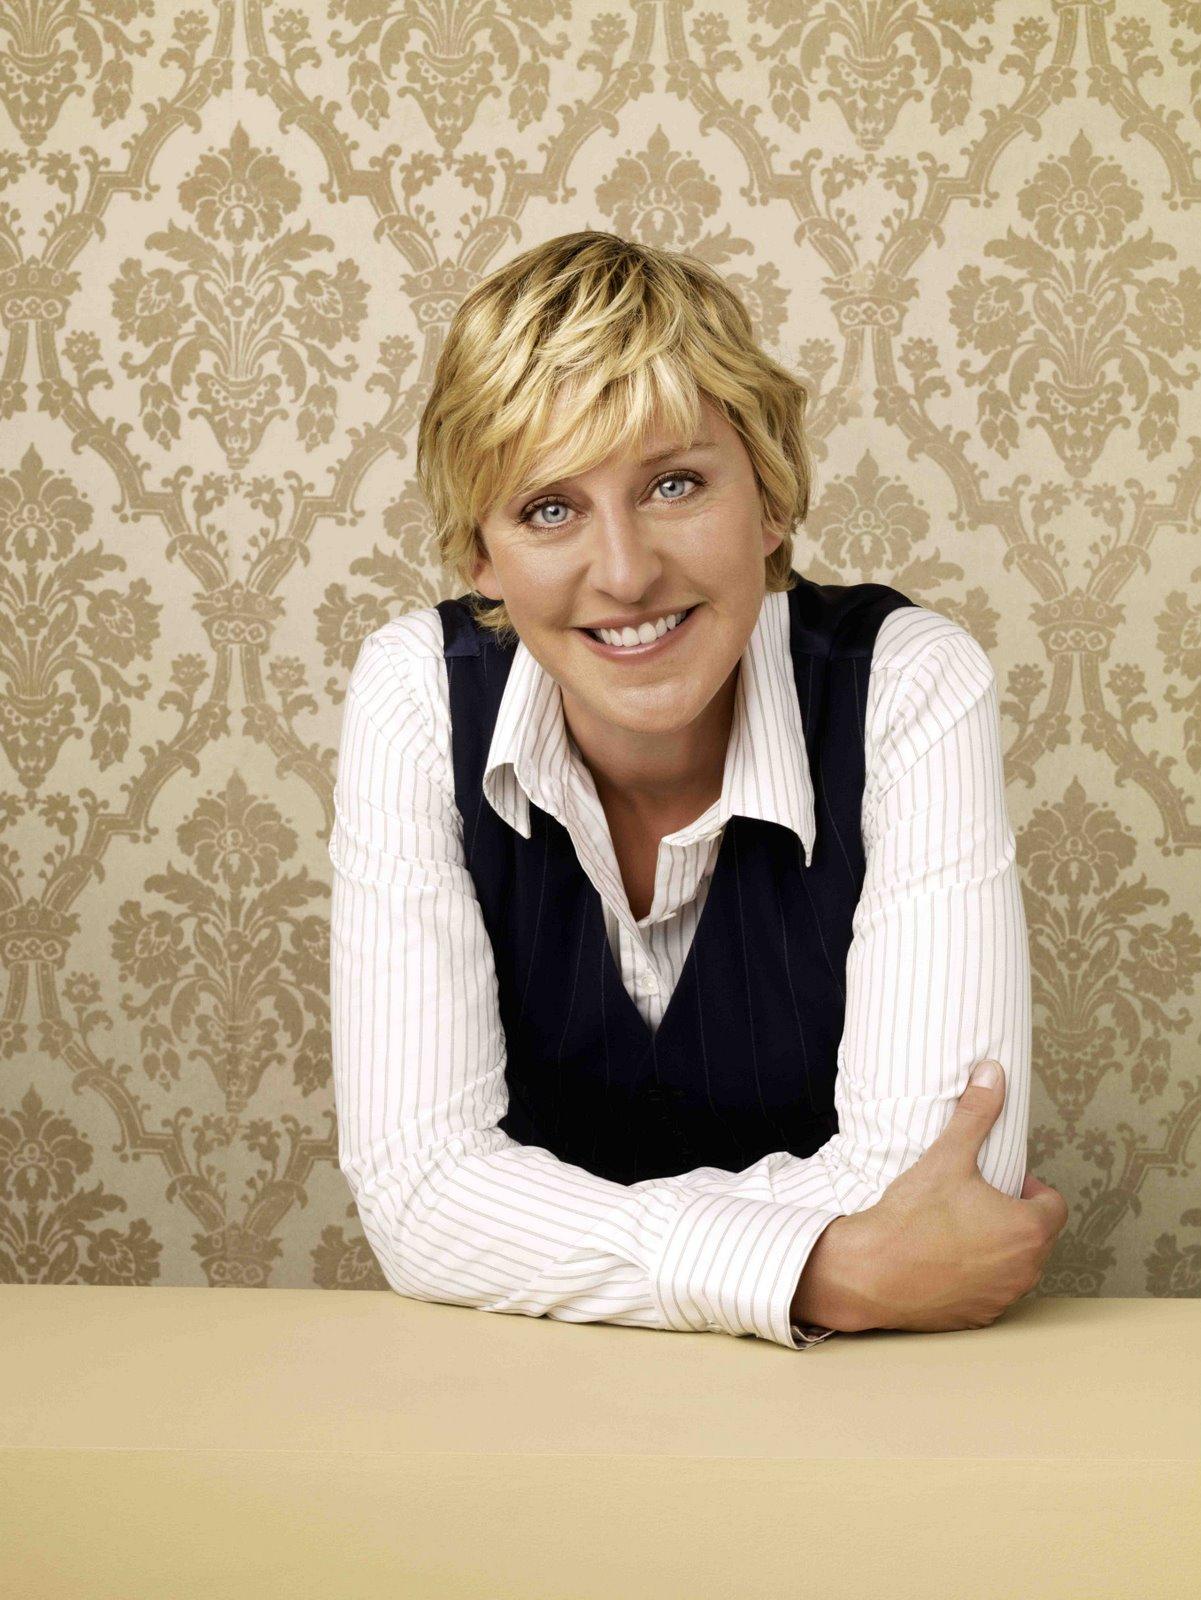 http://3.bp.blogspot.com/_BEic_j5OvHM/SFgjyxcdTwI/AAAAAAAABfo/oswMGnE6GgI/s1600/Ellen%2BDeGeneres.jpg